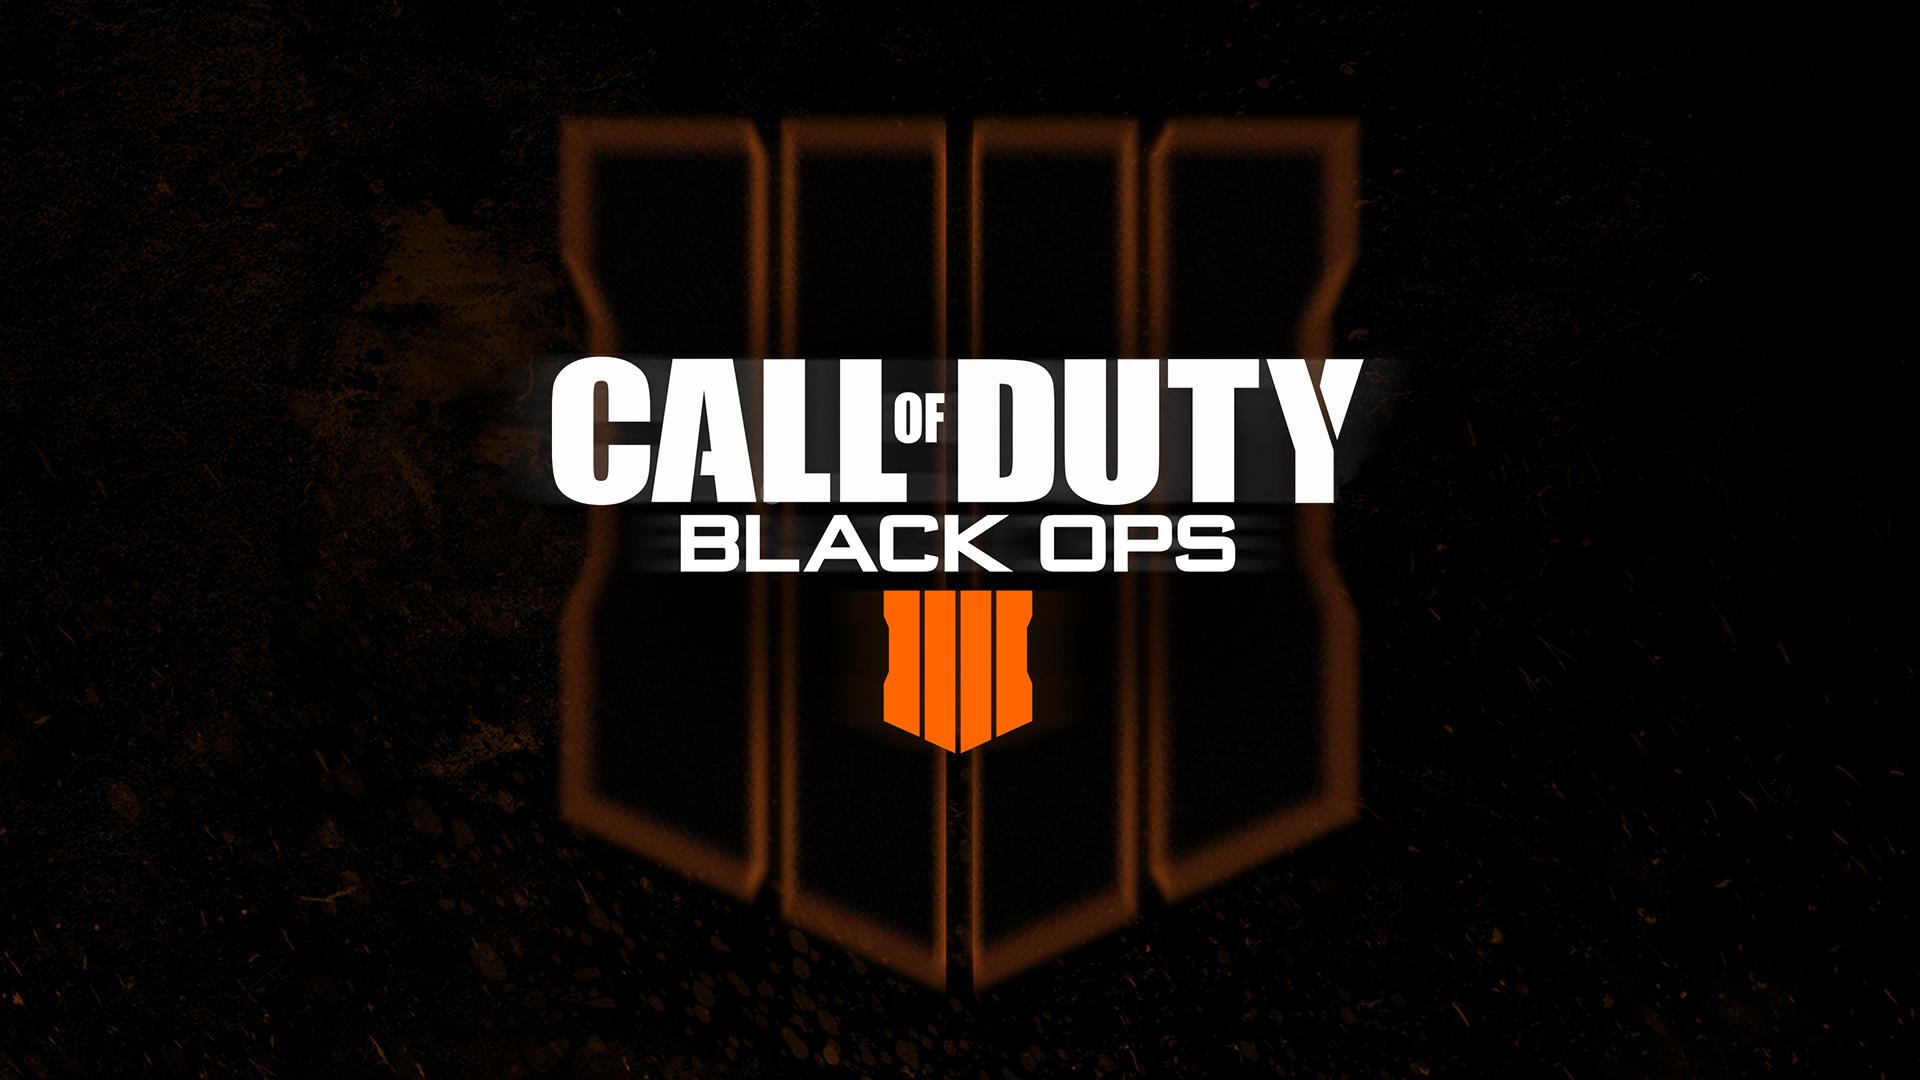 Sfondi call of duty black ops 4